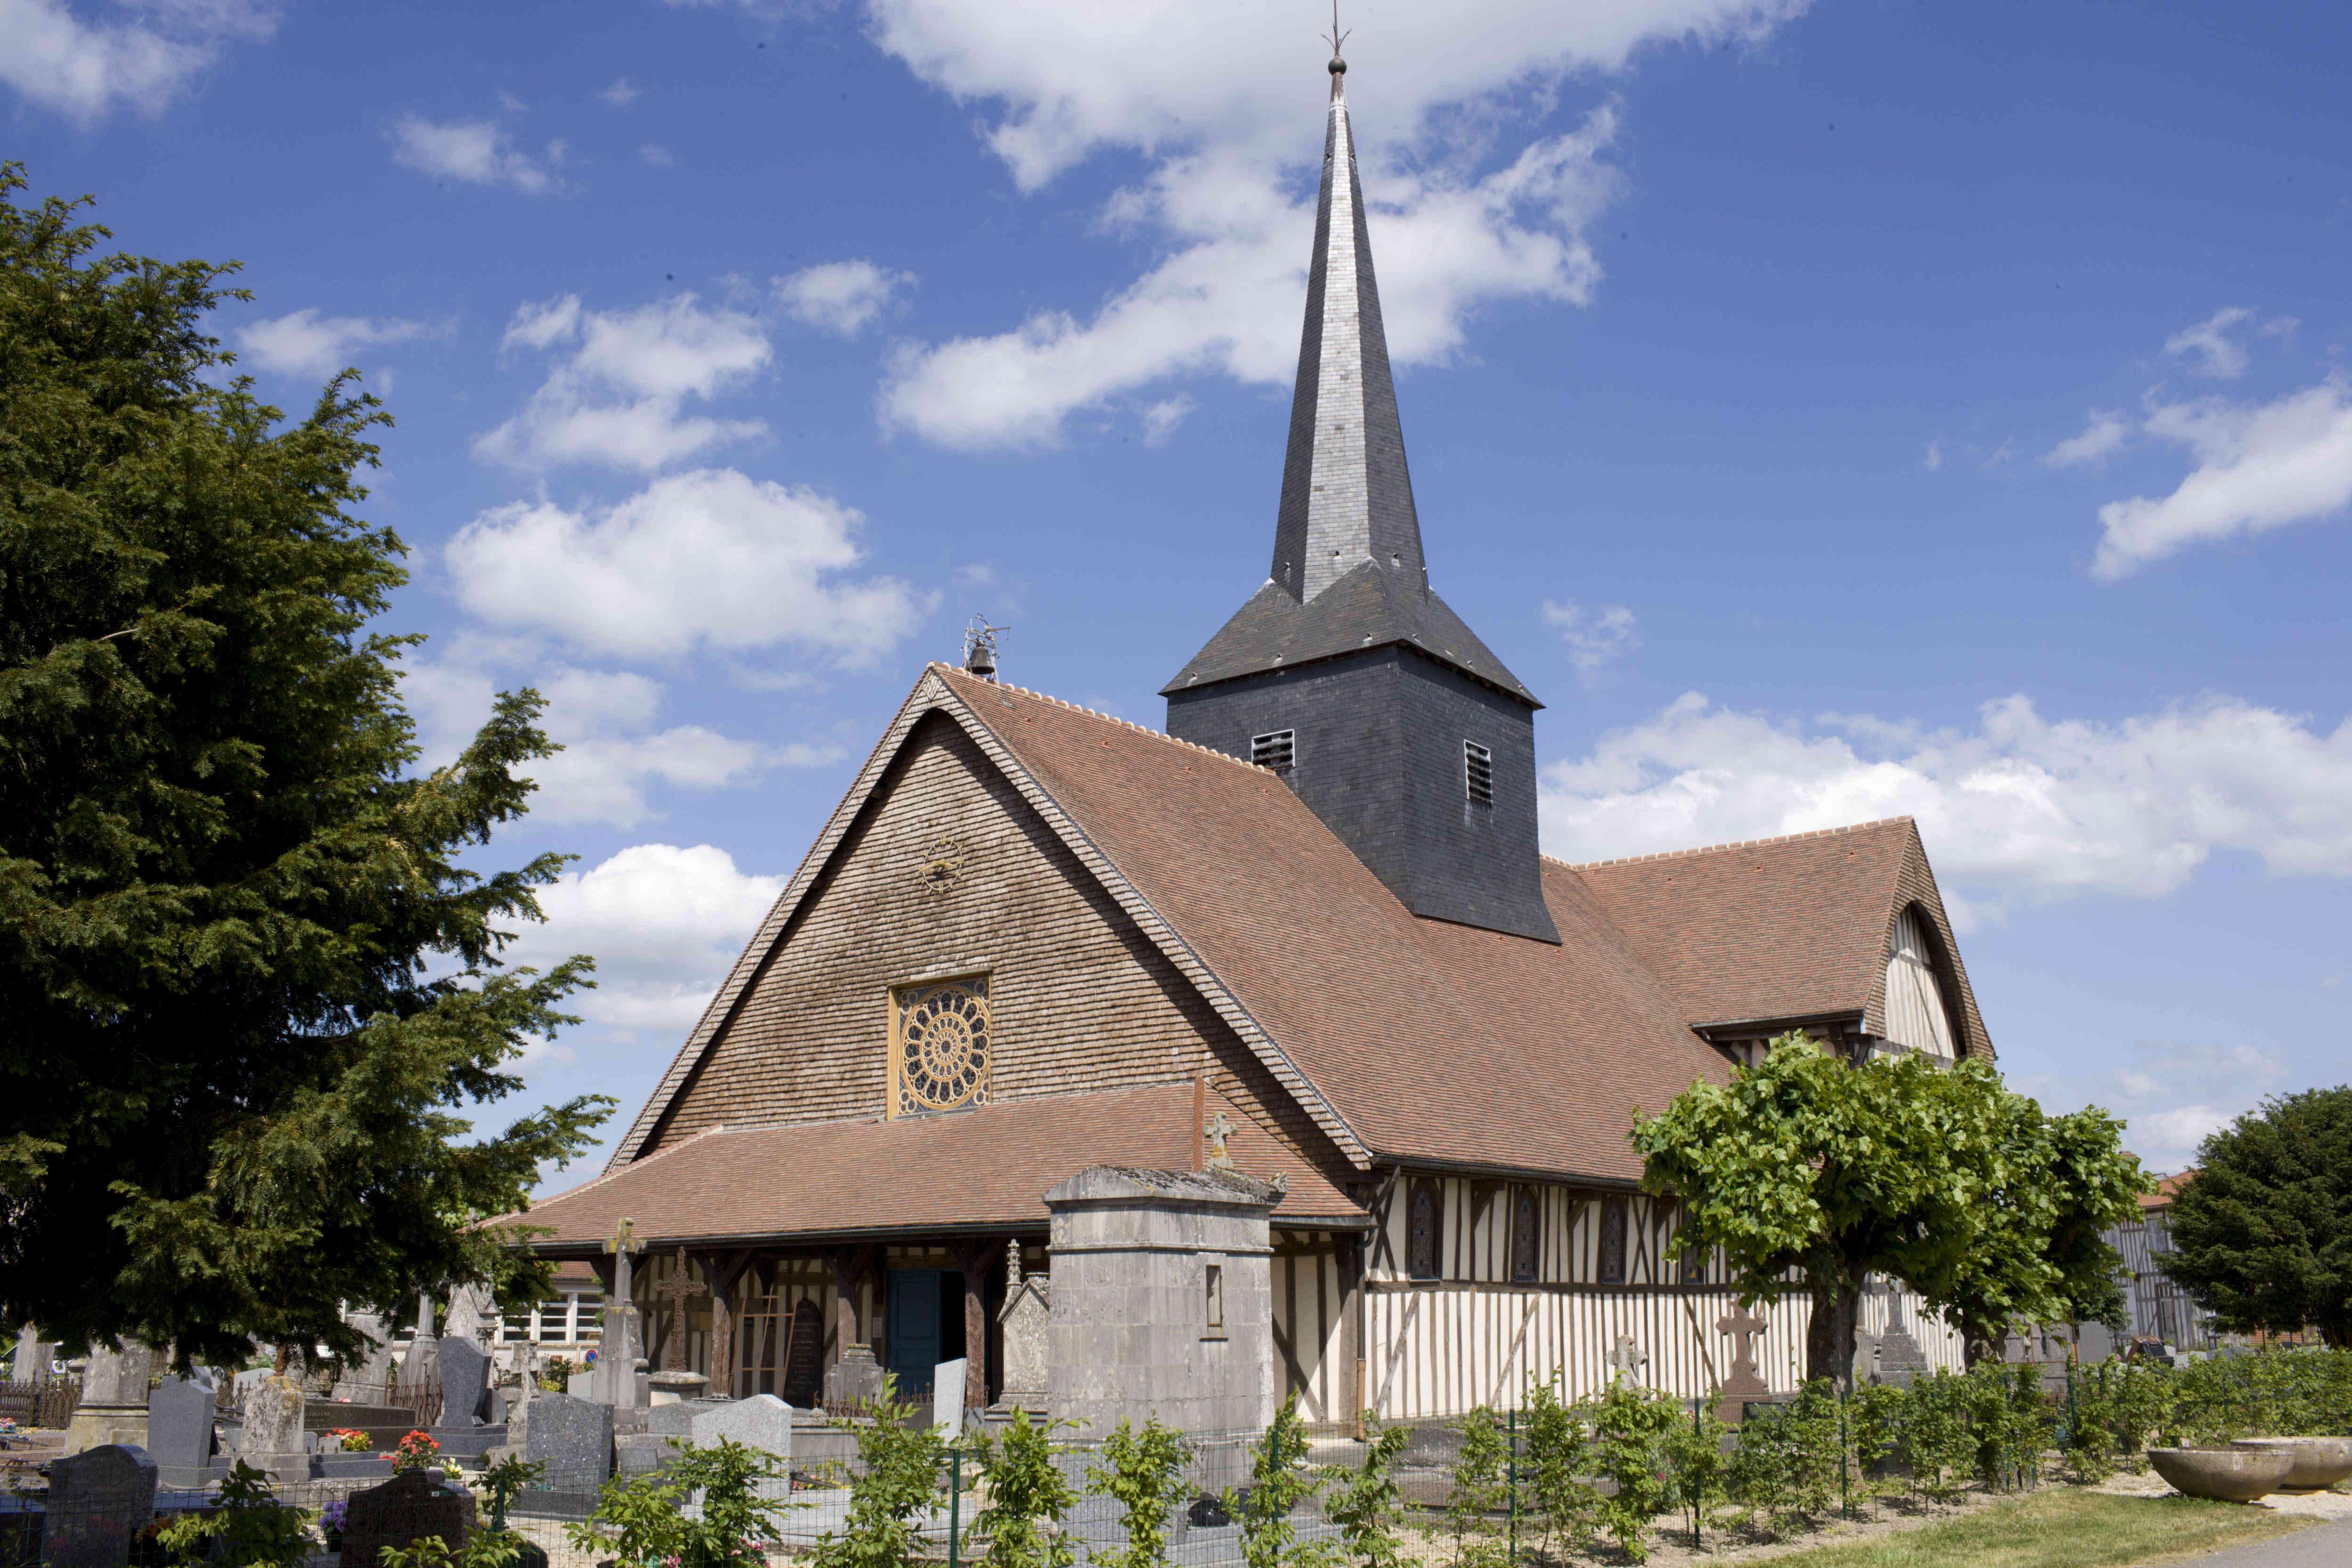 Eglise de Bailly-le-Franc